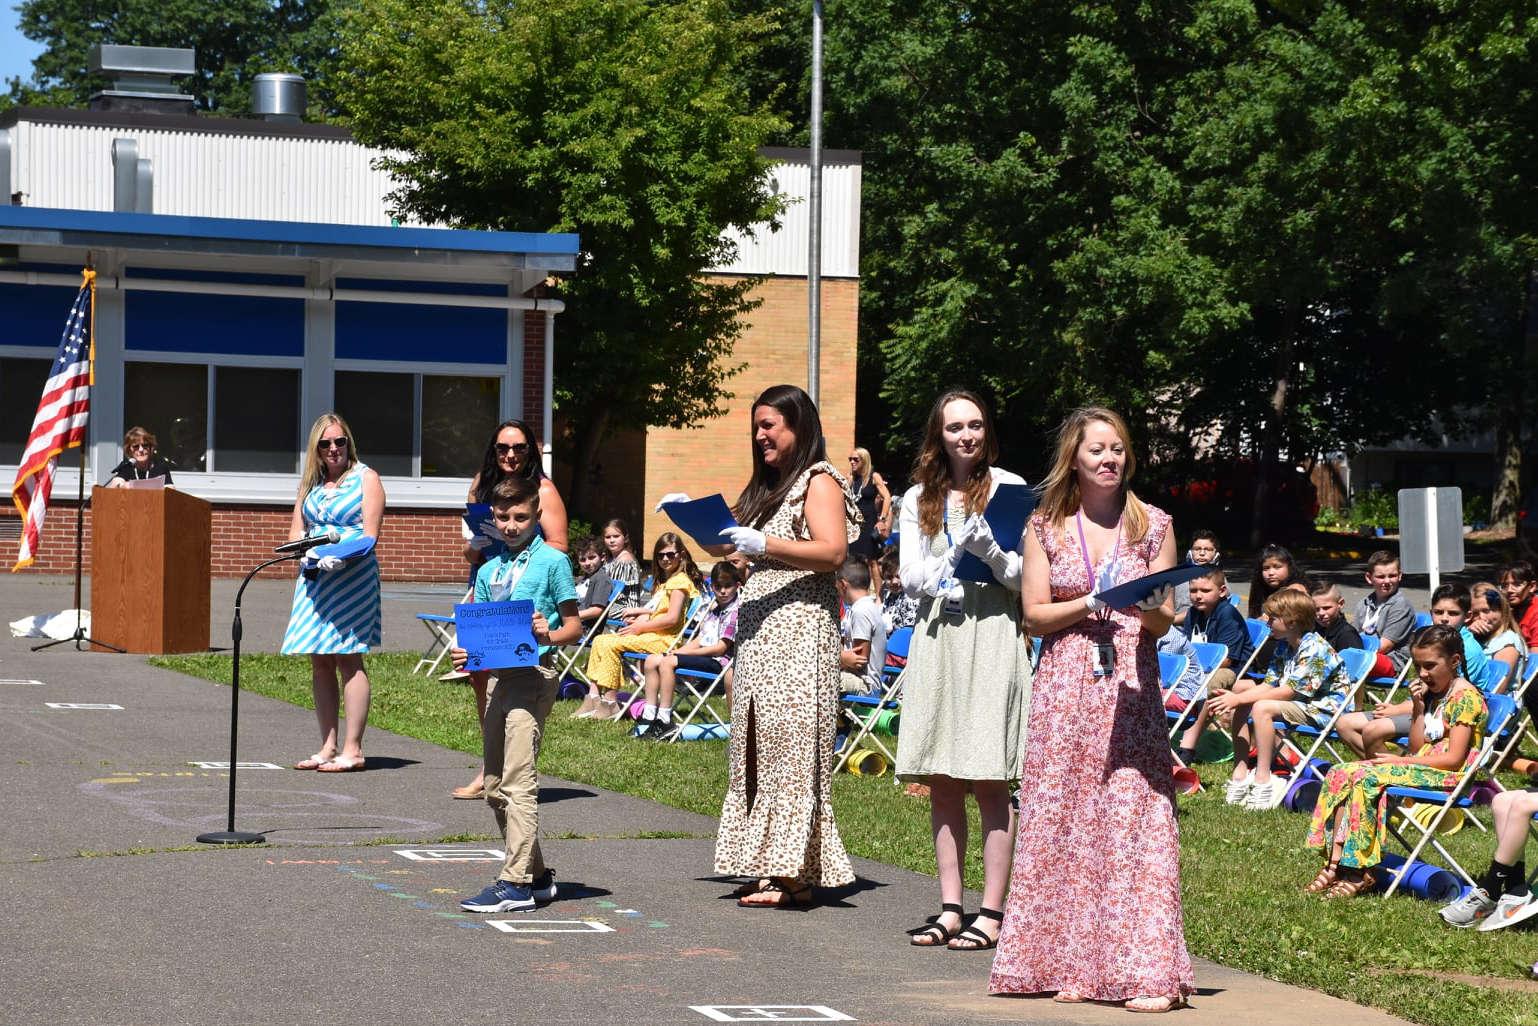 Evans Park Grade 4 Promotion Ceremony held on 6/16/21